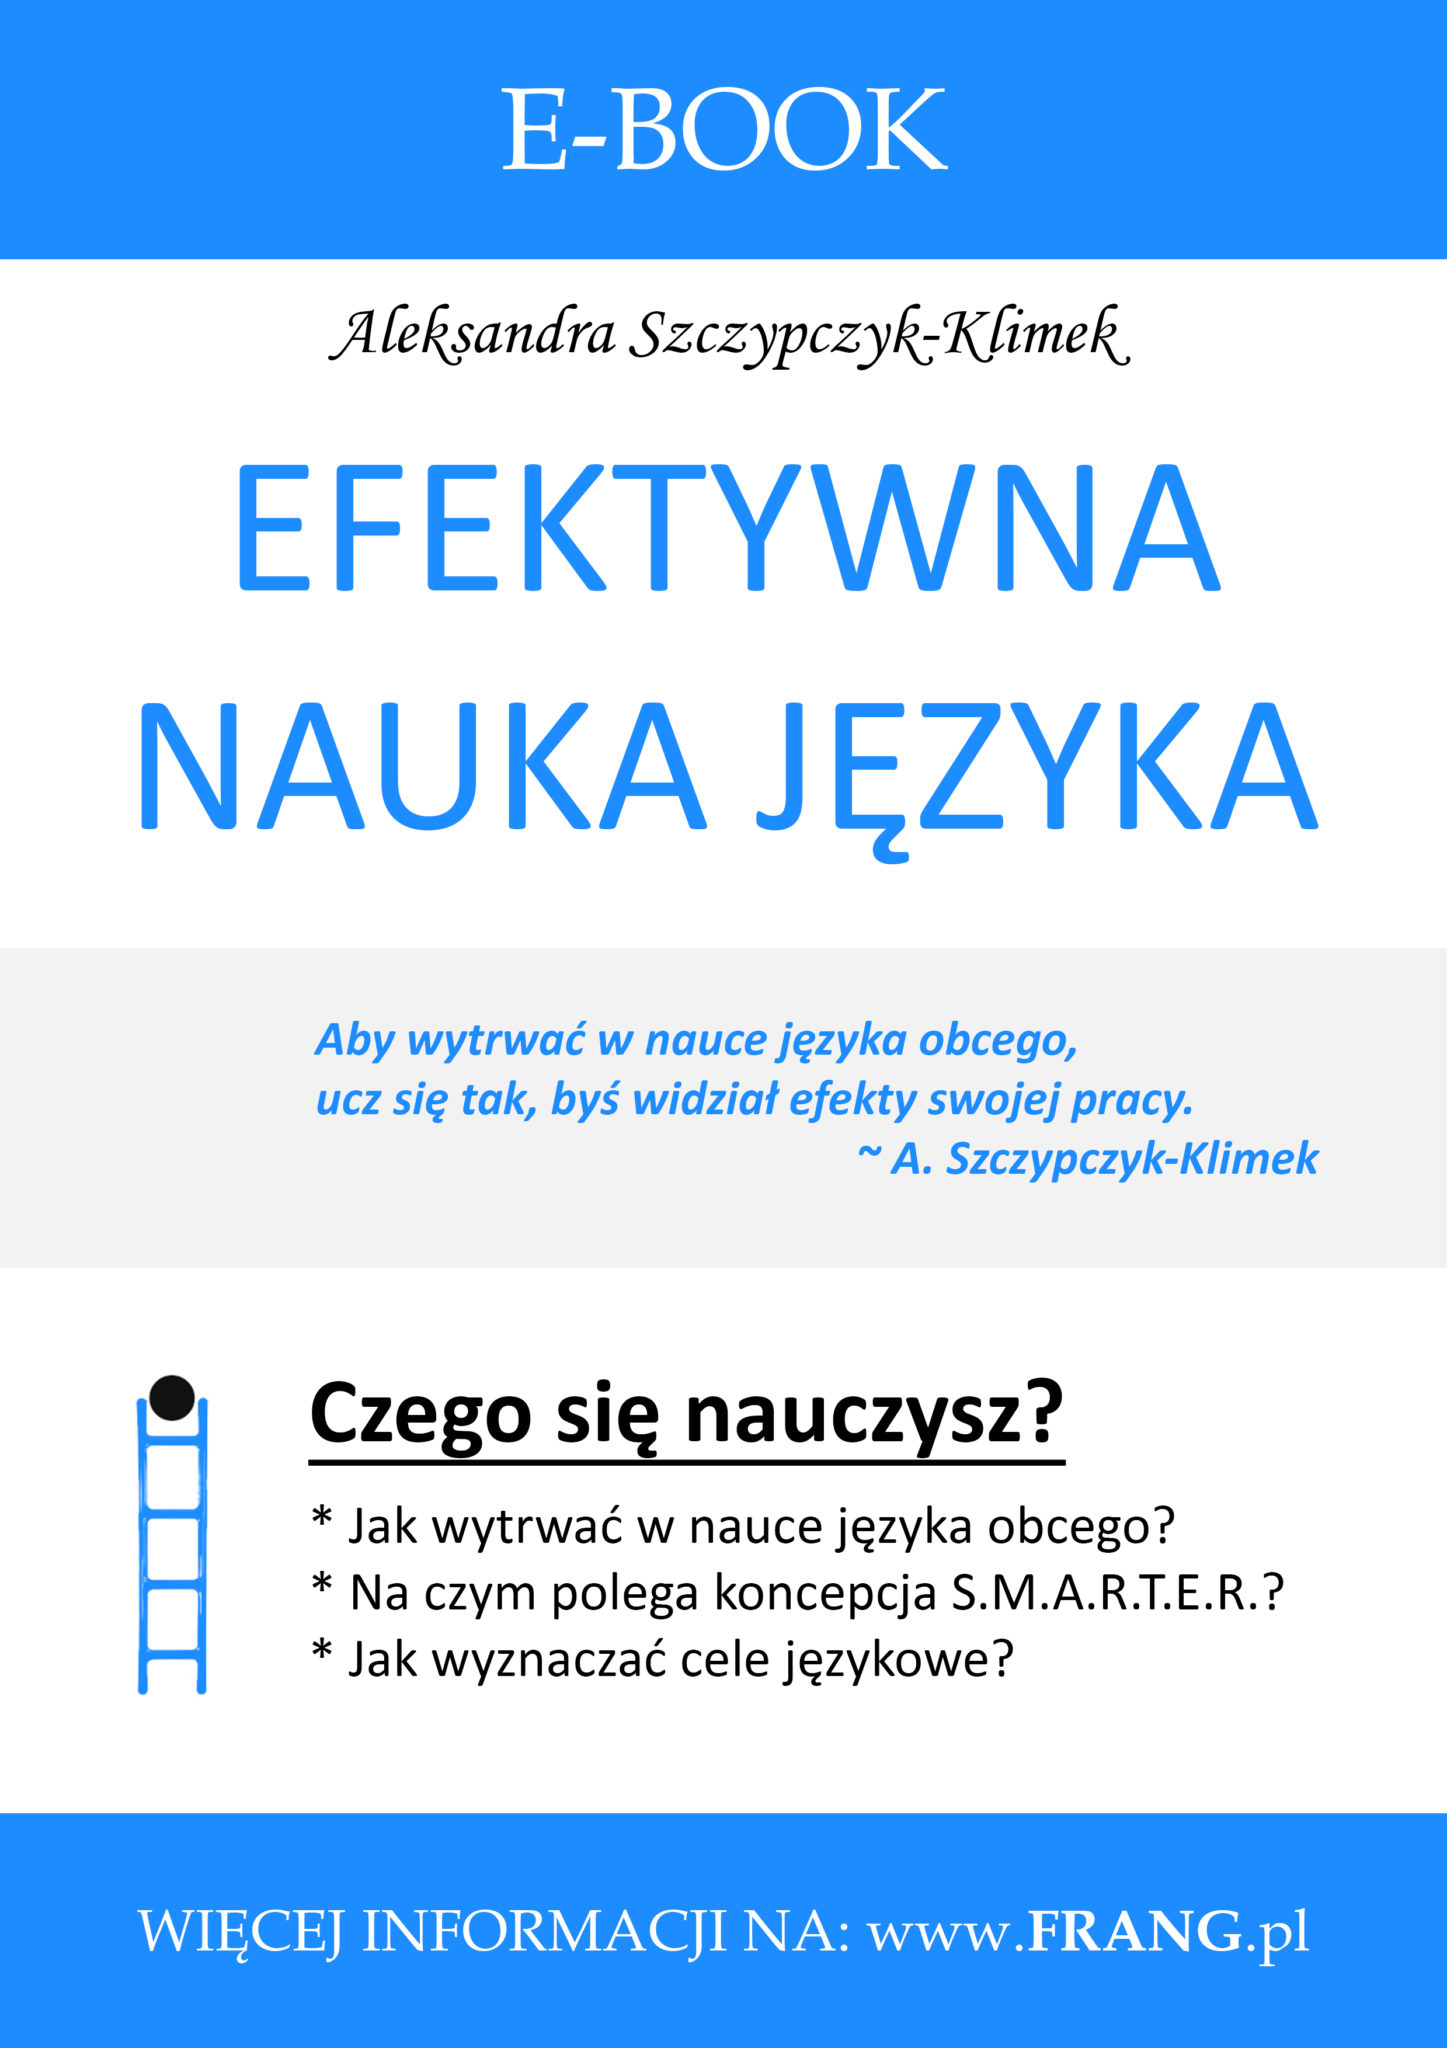 Efektywna nauka języka - ebook FRANG